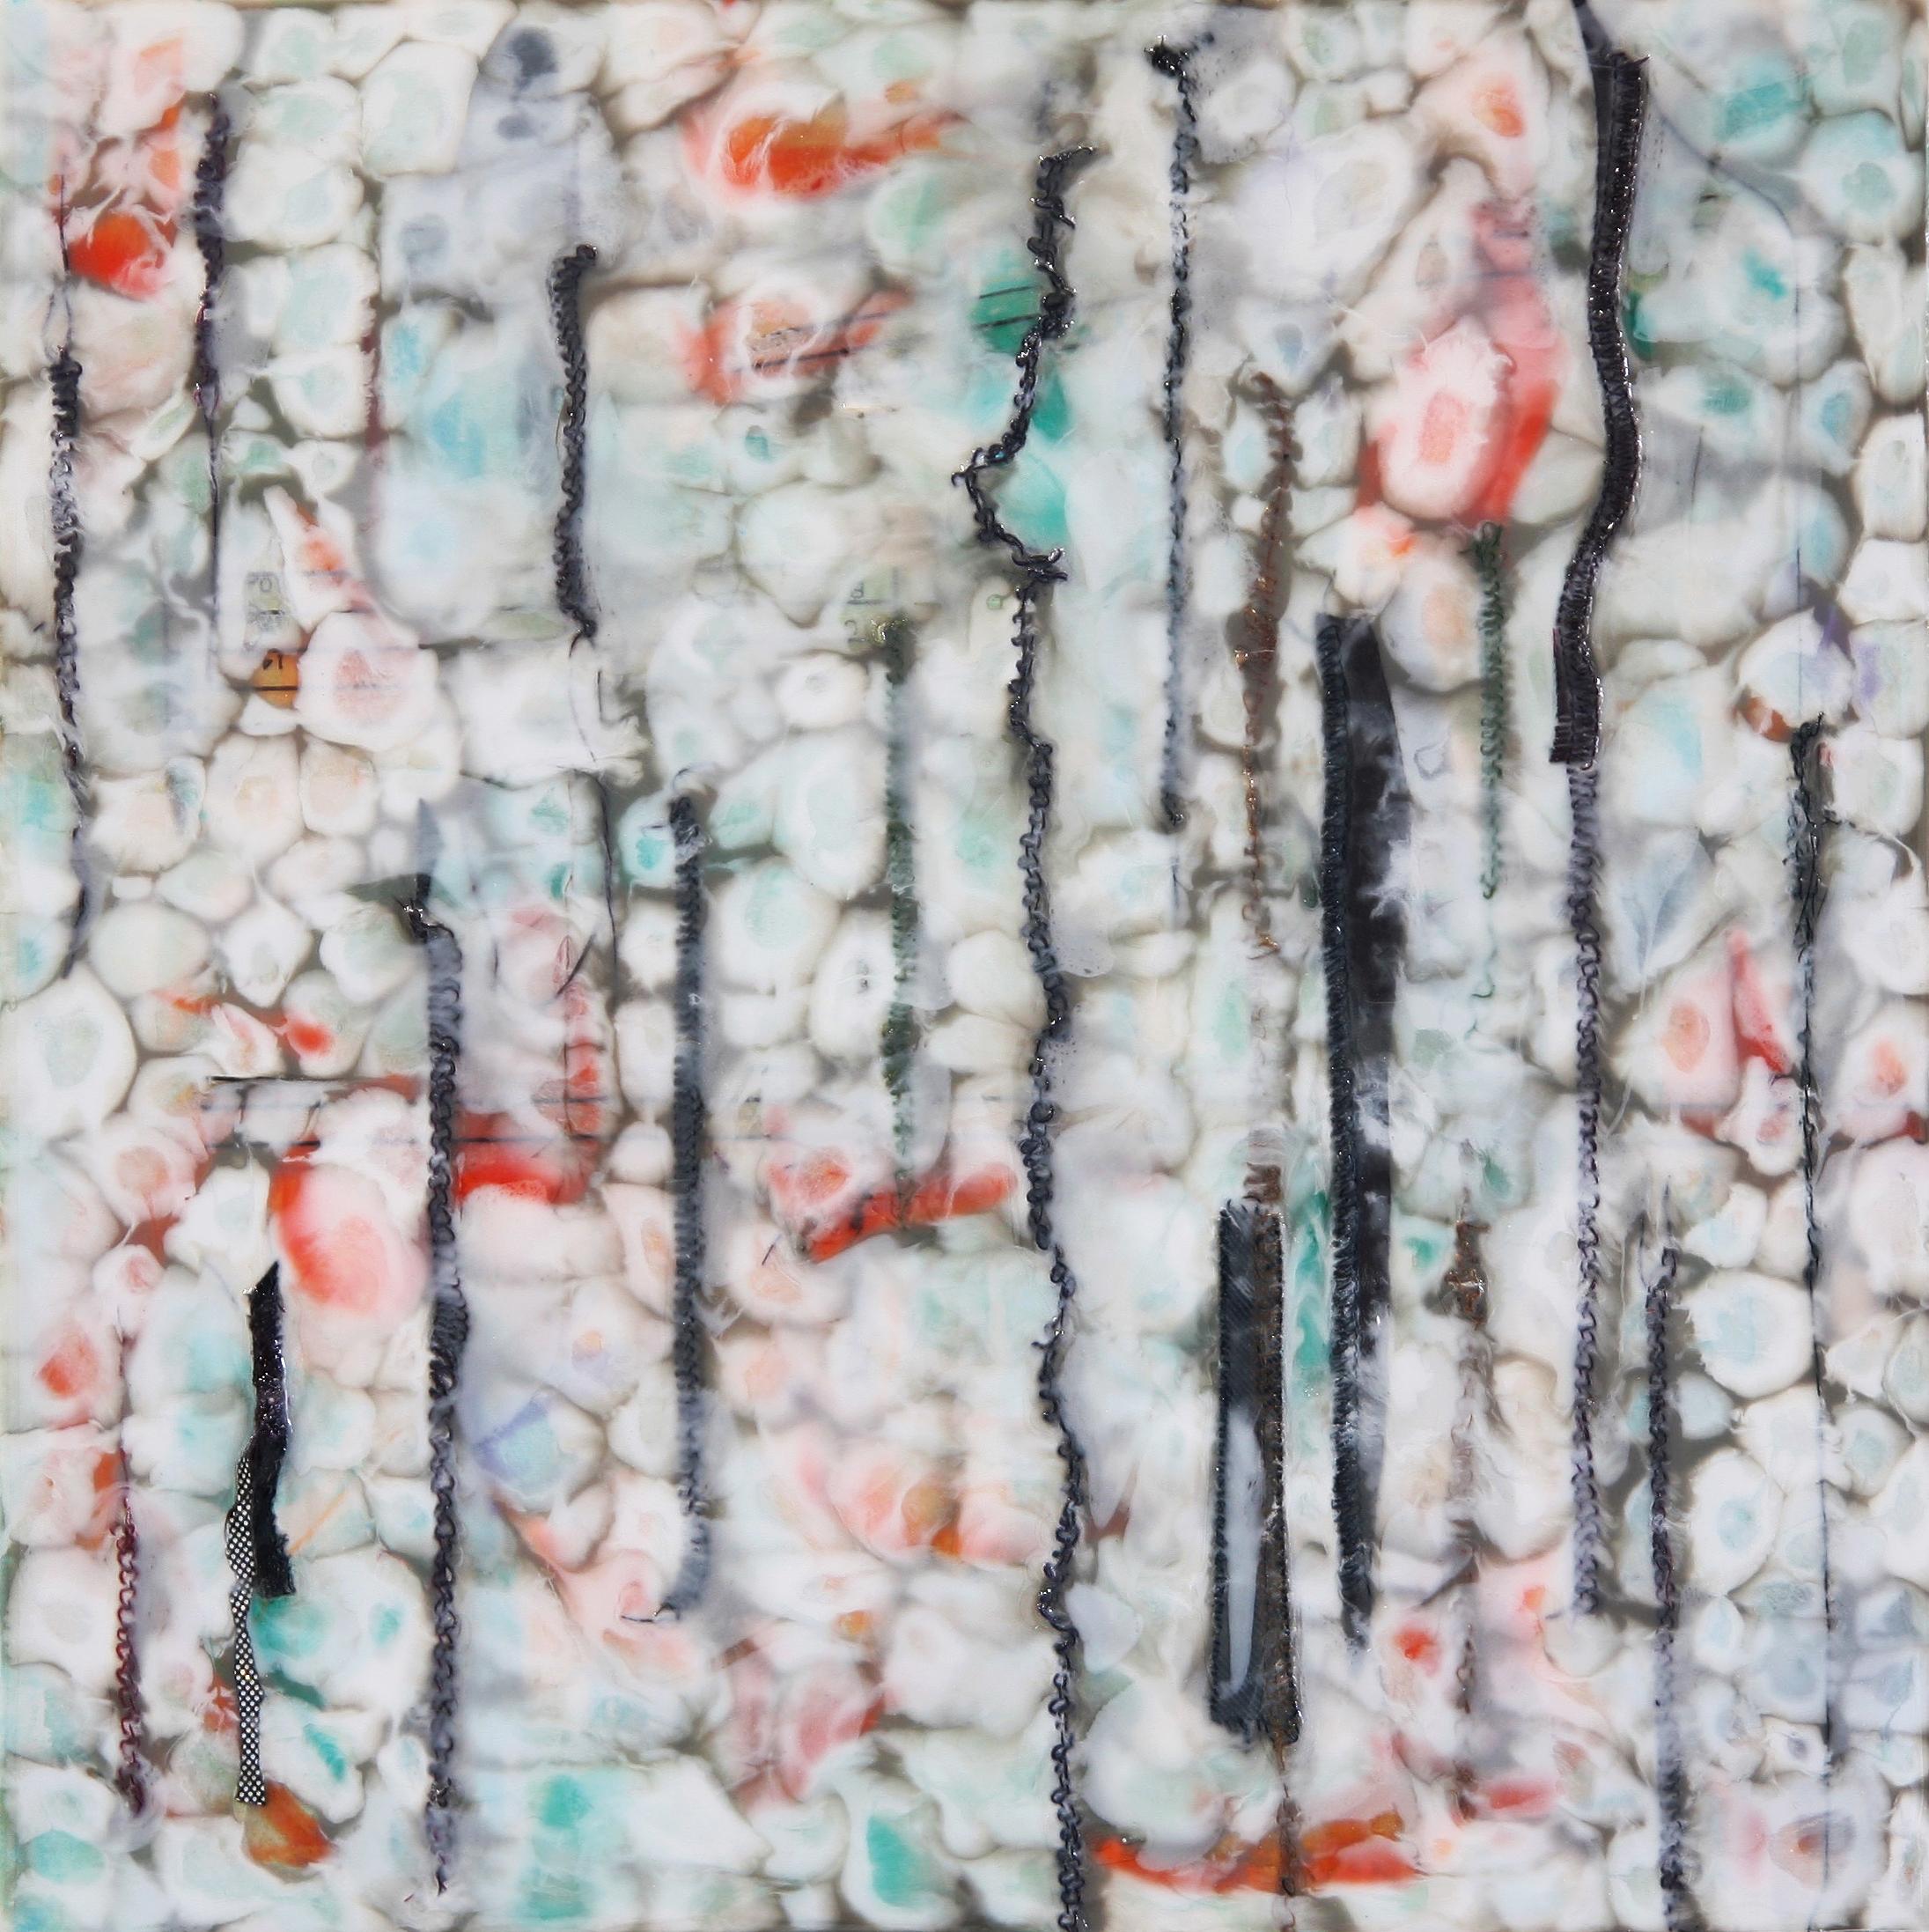 mixed media painting by Farida Hughes